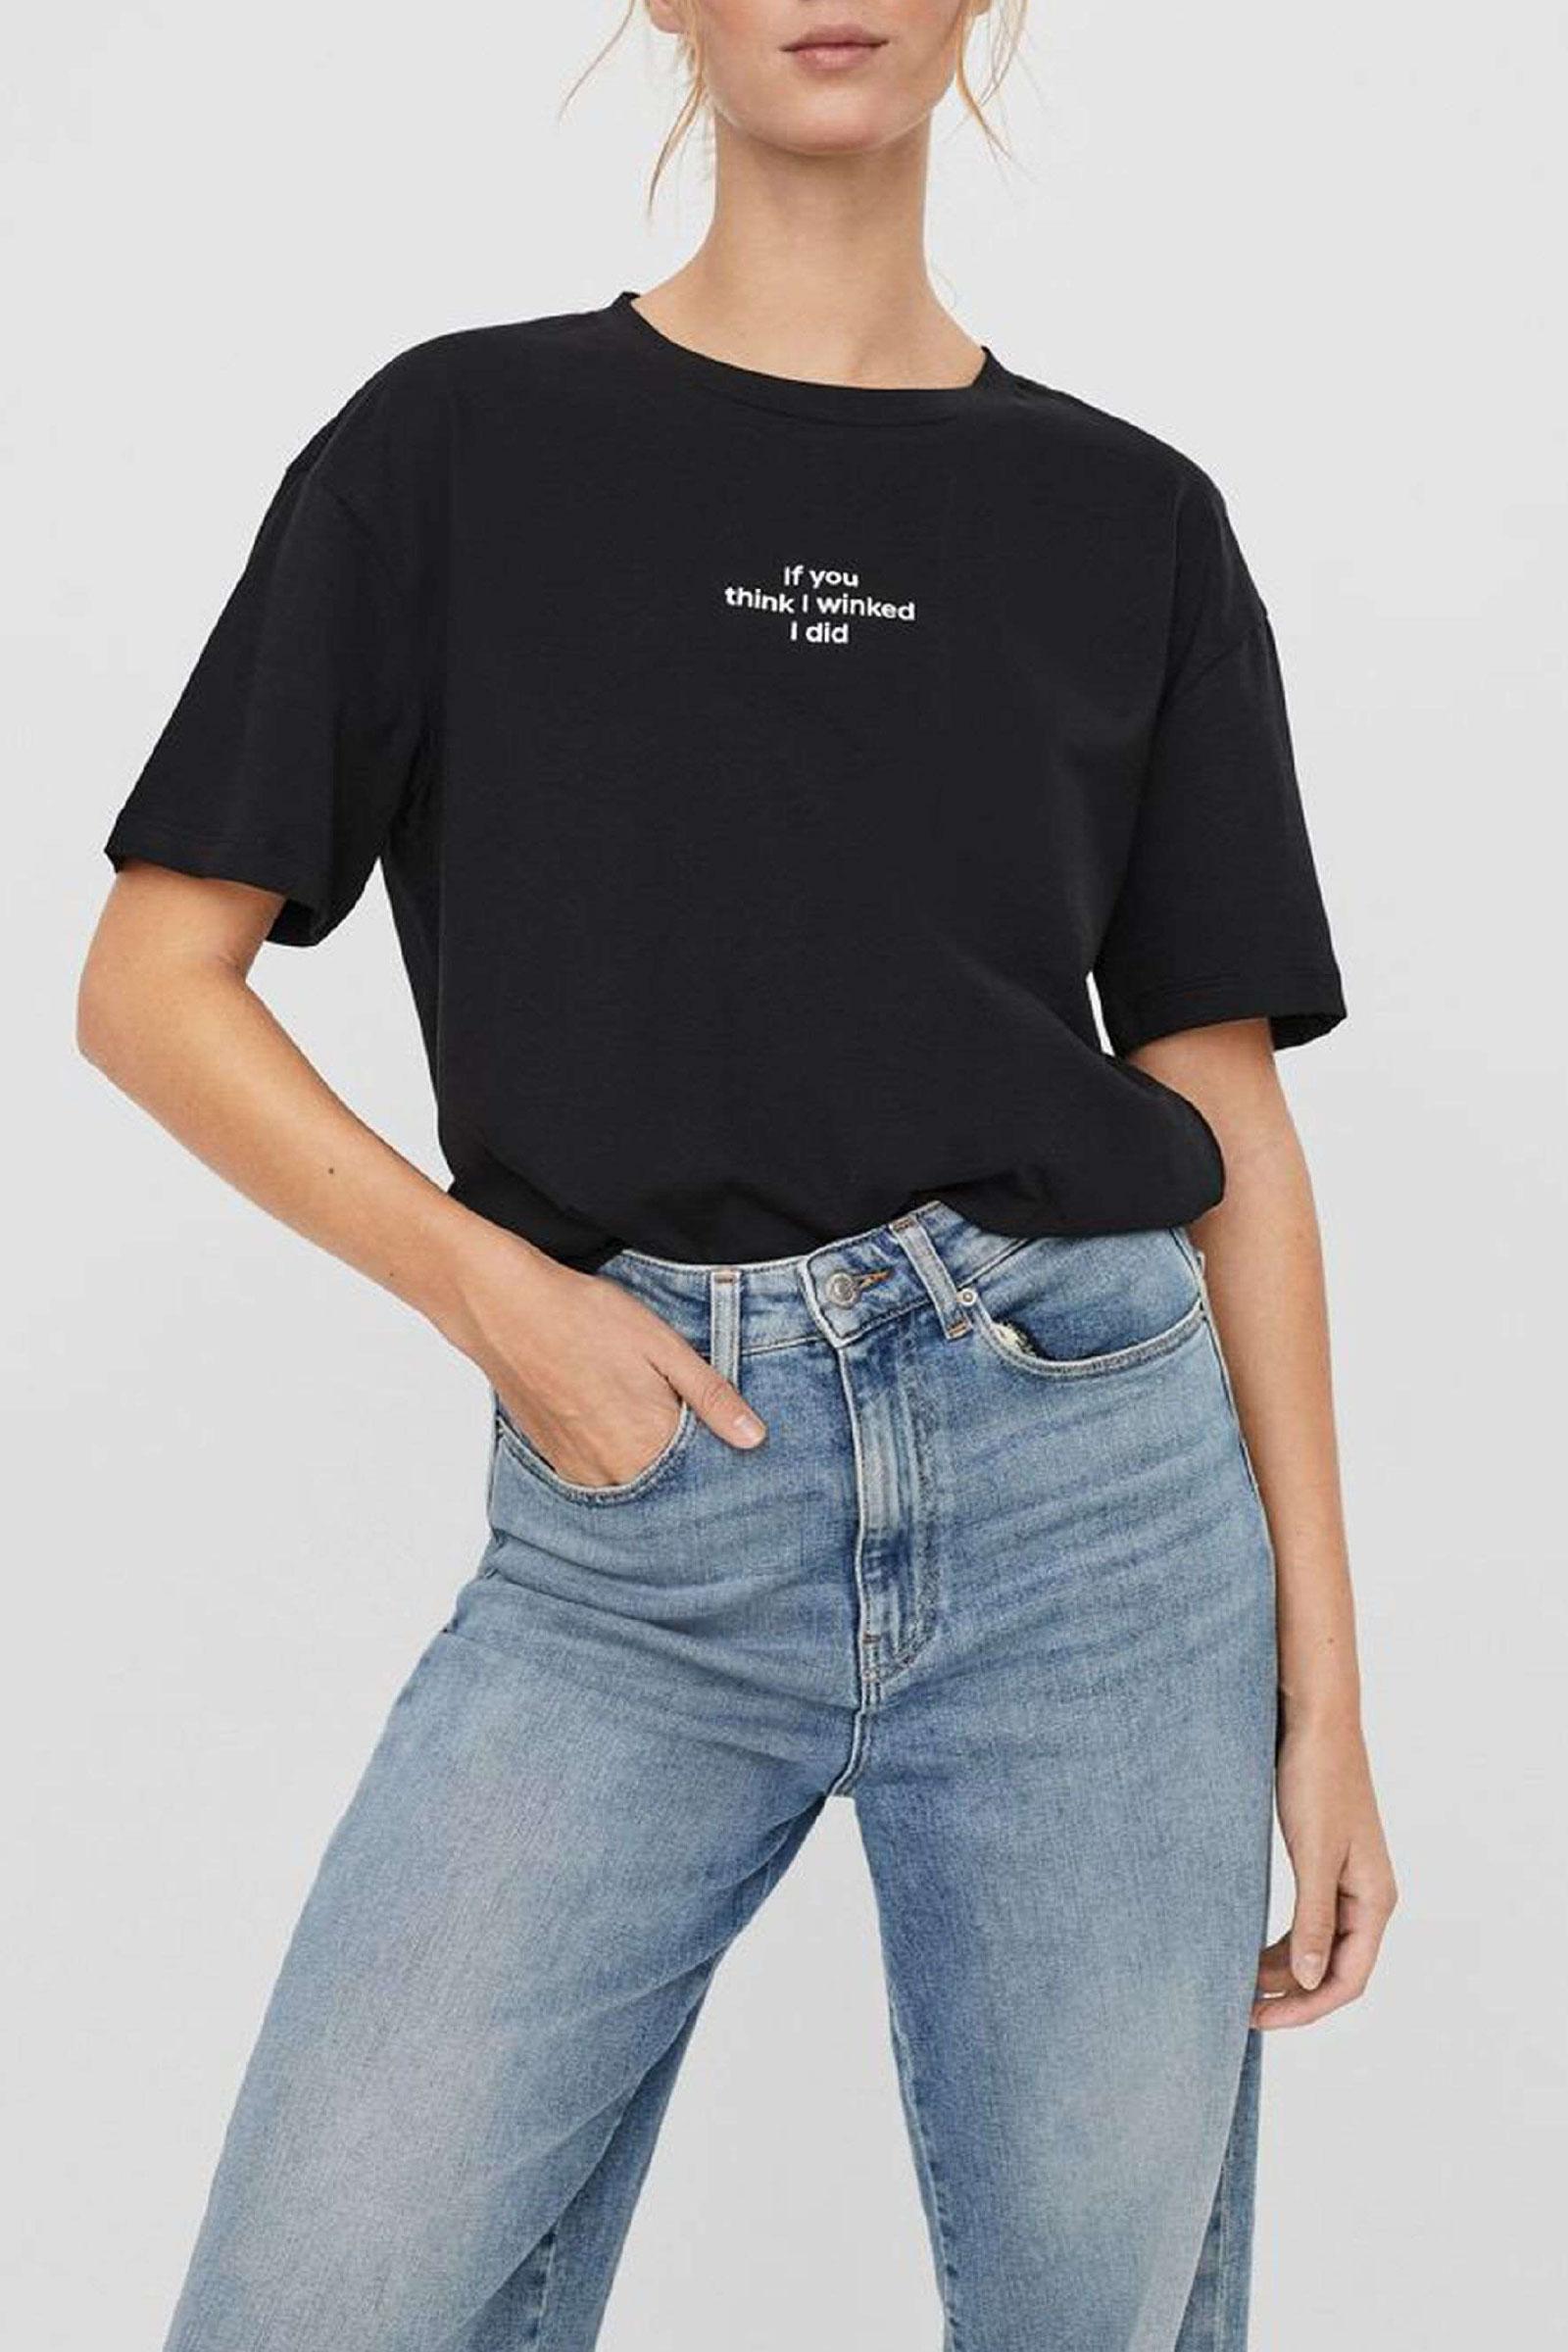 VERO MODA Women's T-Shirt VERO MODA | T-Shirt | 10243932Print-OF YOU THINK I WINKED